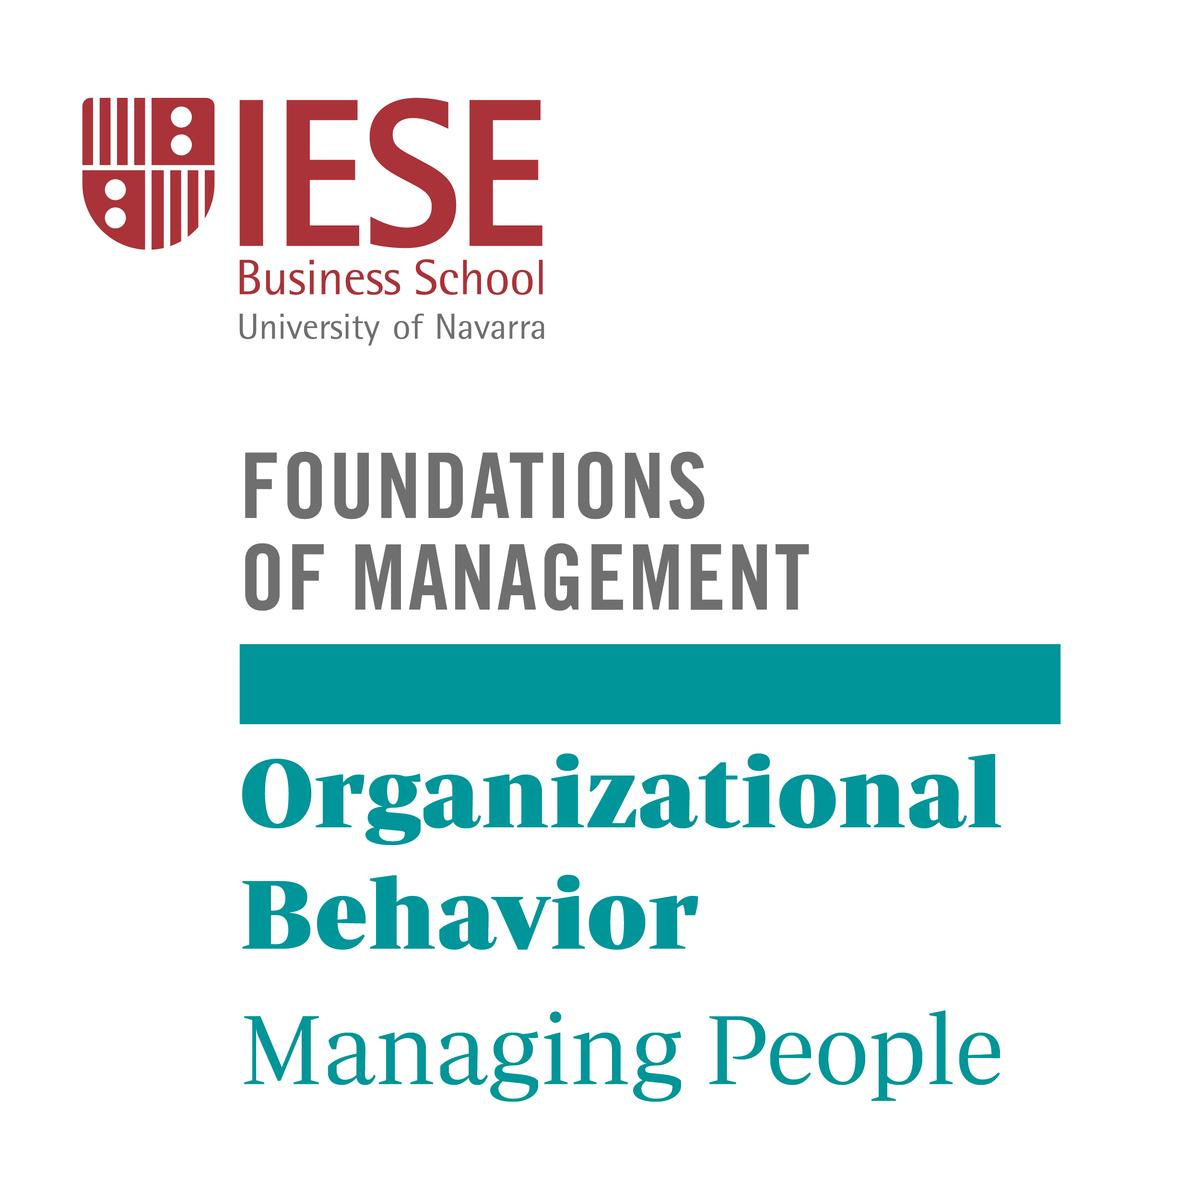 Organizational Behavior: Managing People